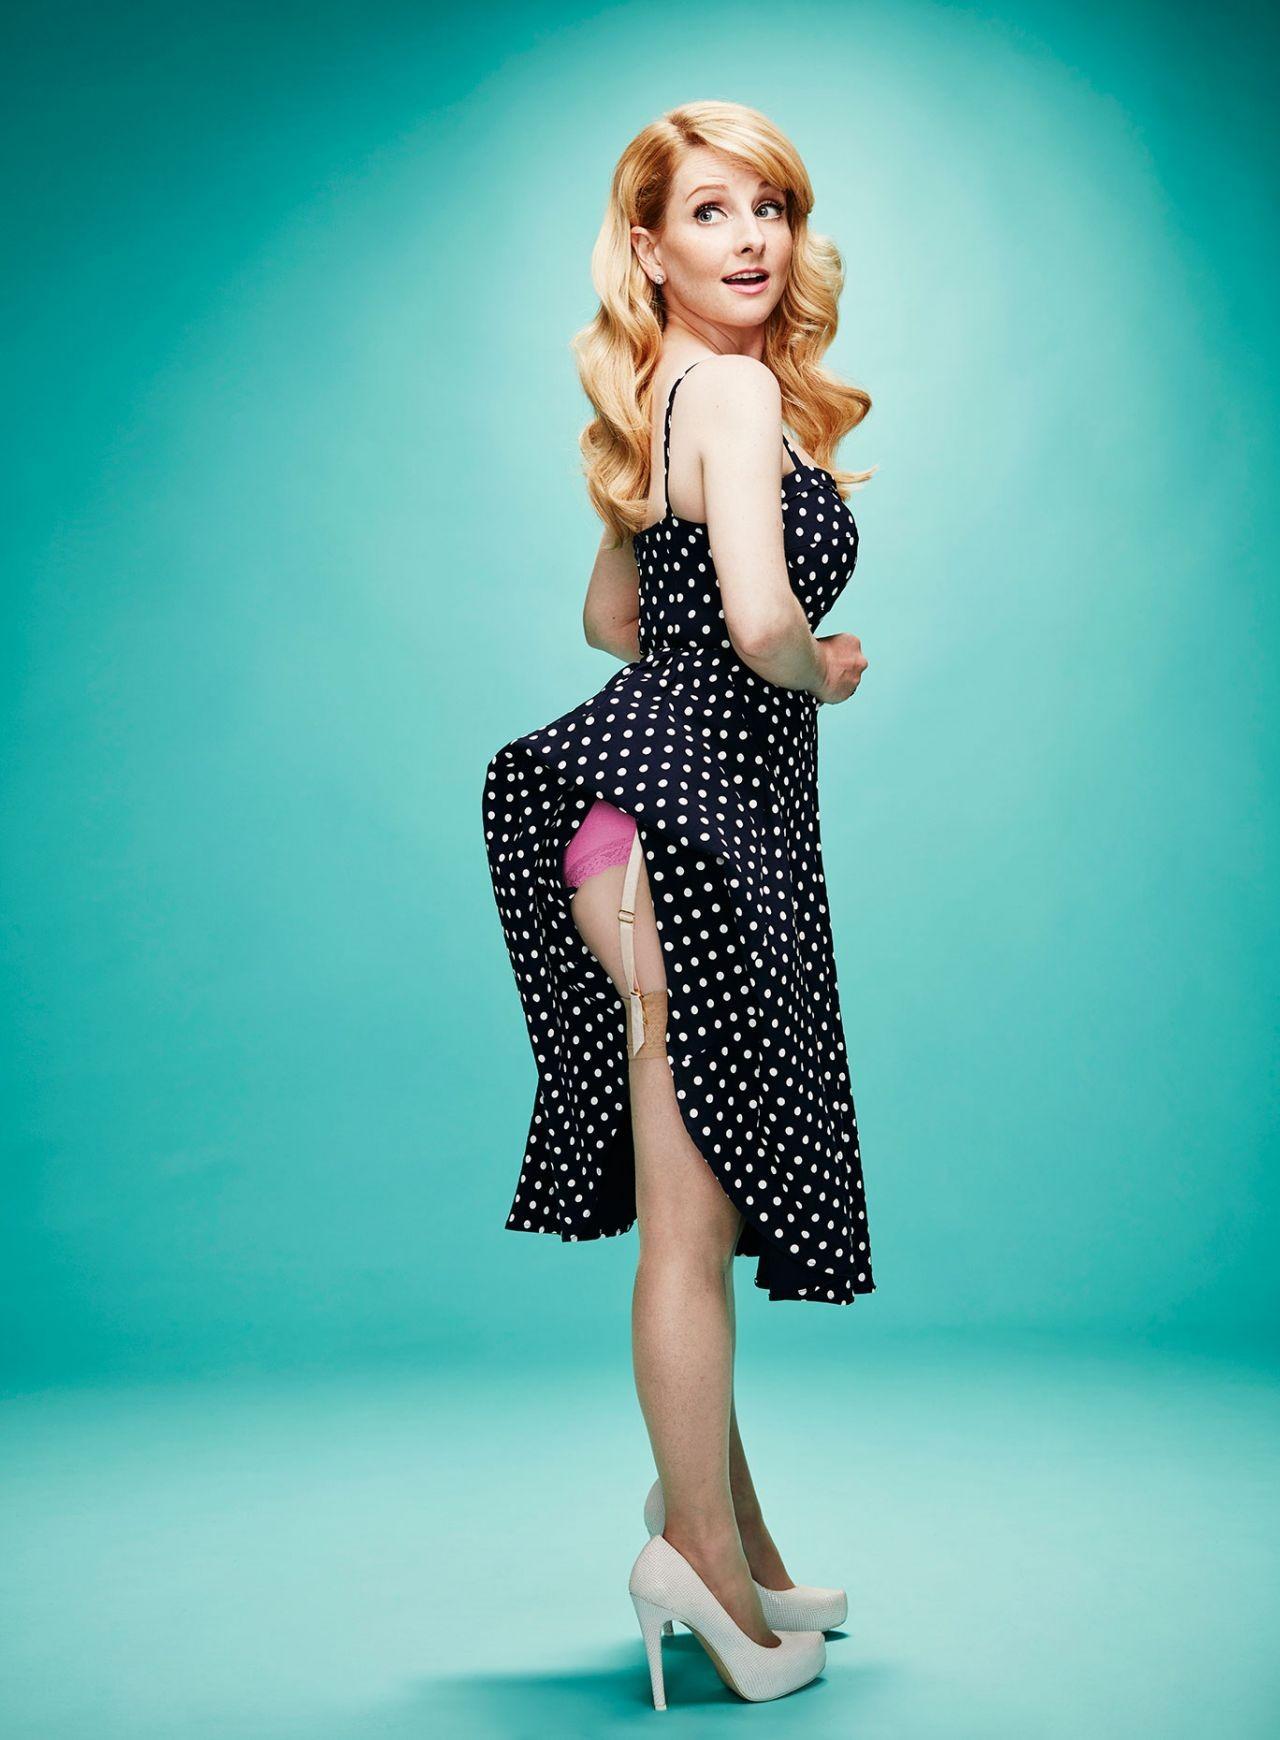 Wallpaper Melissa Rauch Actress Blonde Green Eyes Polka Dots